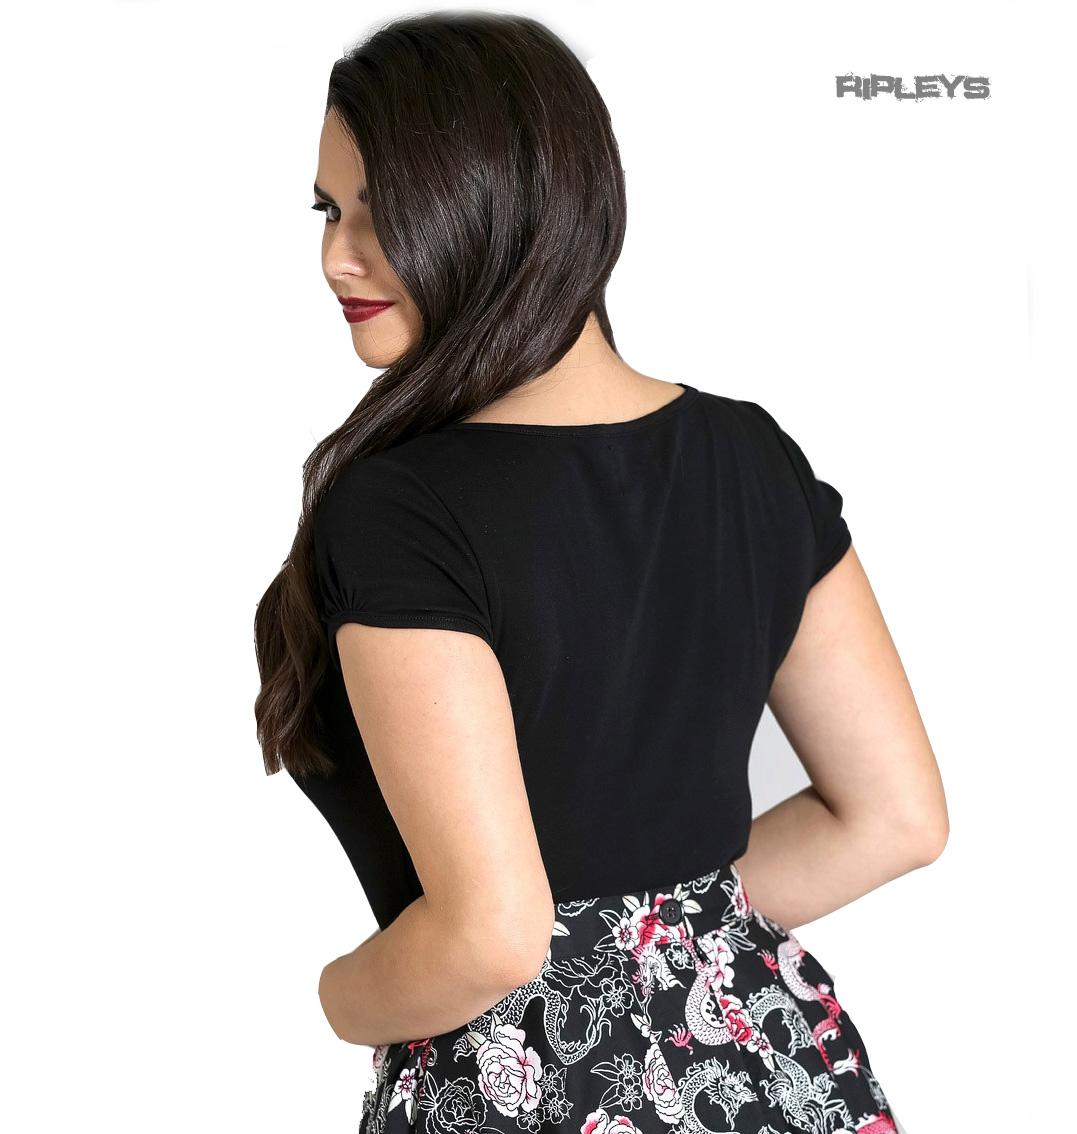 Hell-Bunny-Shirt-50s-Rockabilly-Top-MIA-Plain-Black-Short-Sleeves-All-Sizes thumbnail 10